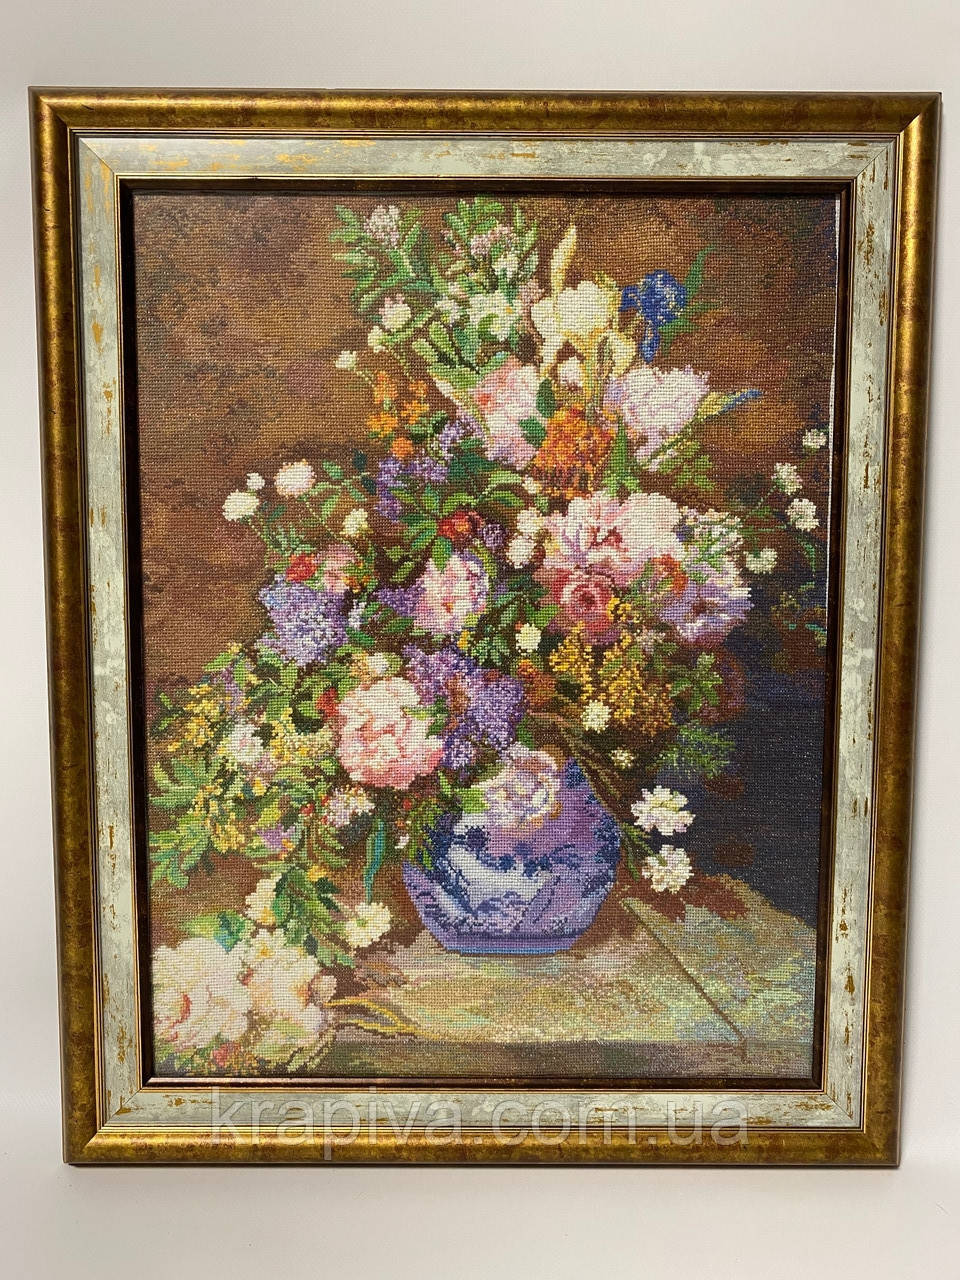 Картина вышивка Цветы 56*45 см, ручная работа, картина вишивка ручної роботи